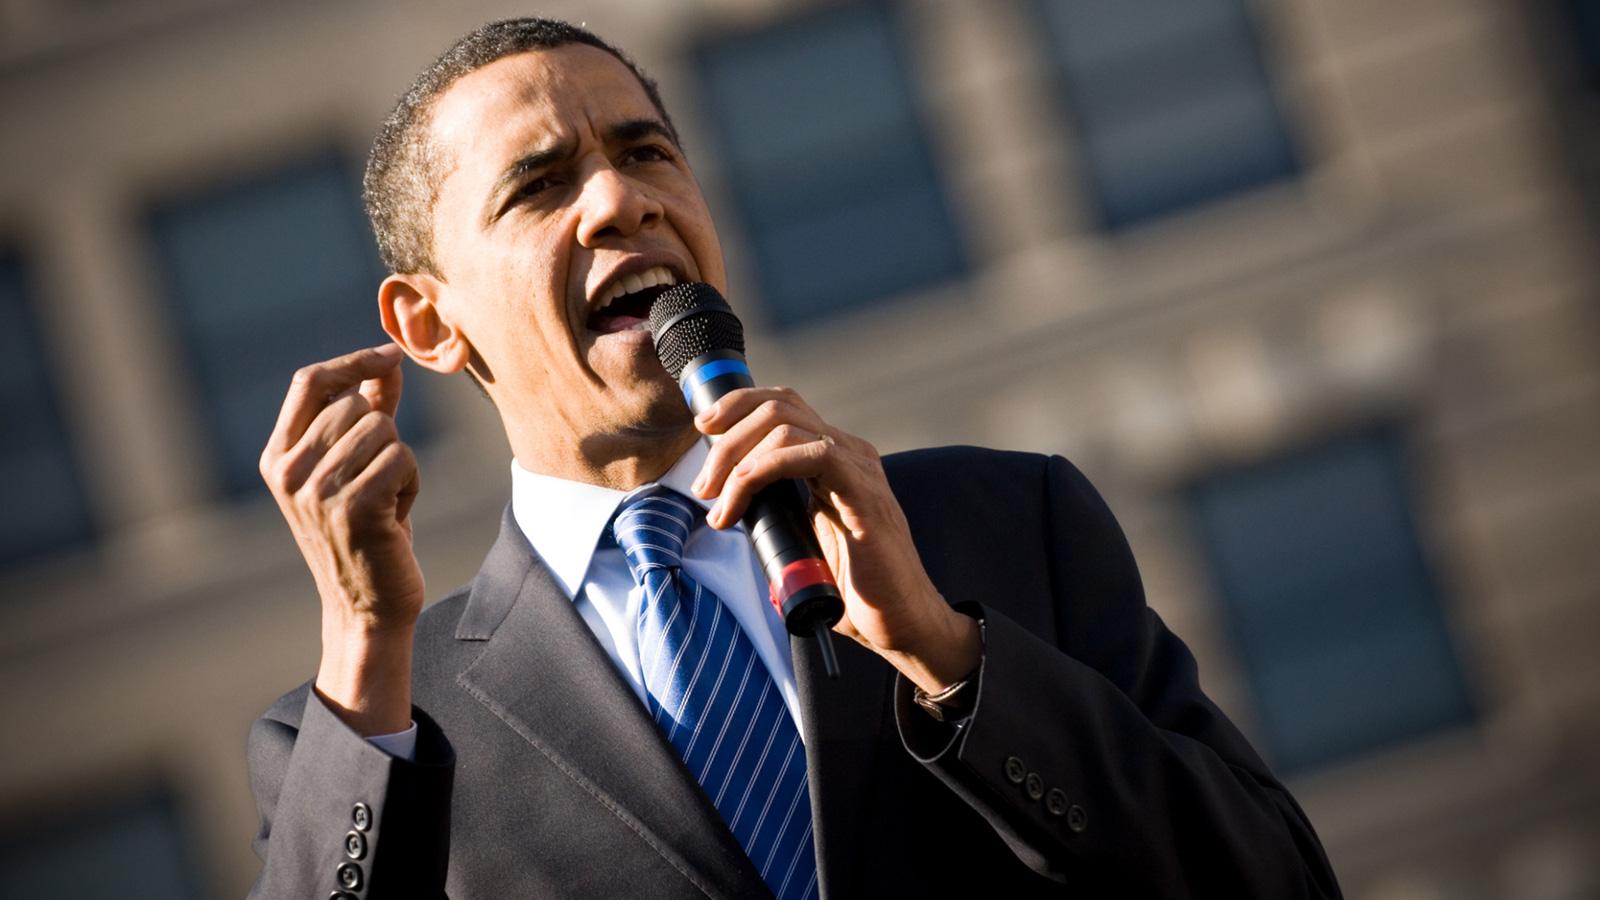 Obama leanon